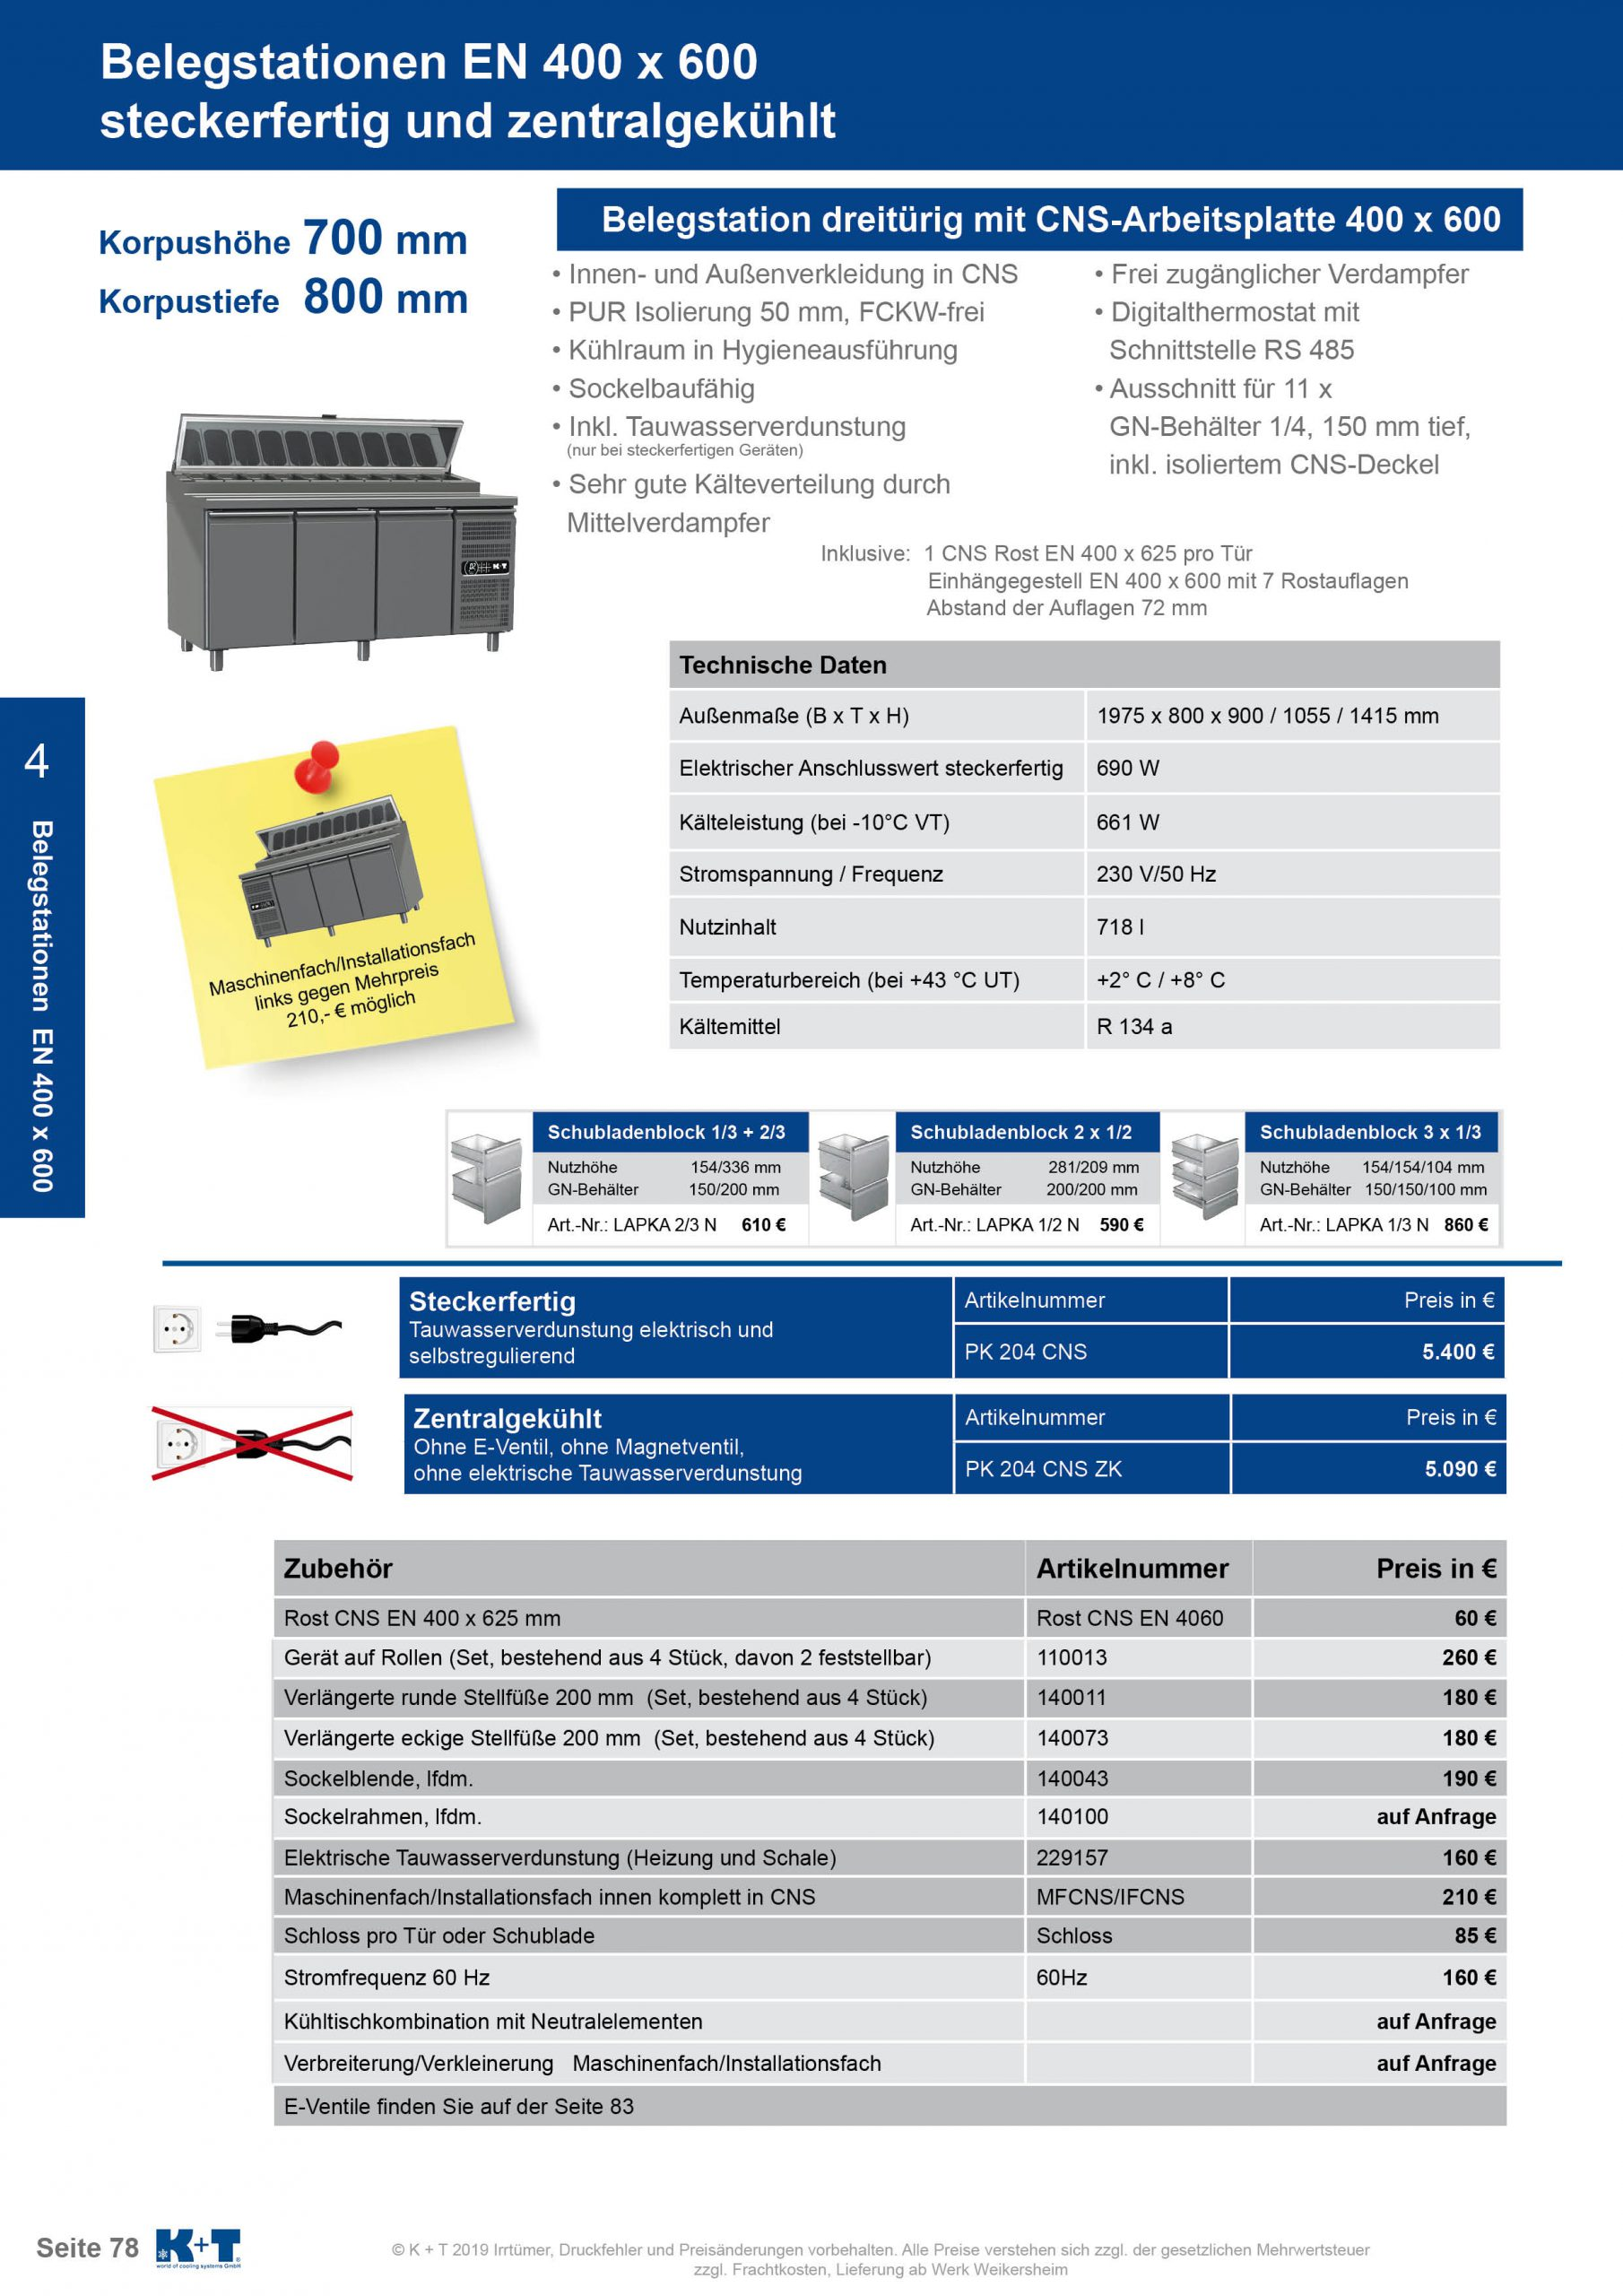 Belegstation Euronorm 400 x 600 Korpushöhe 700, Tiefe 800 zentralgekühlt 3